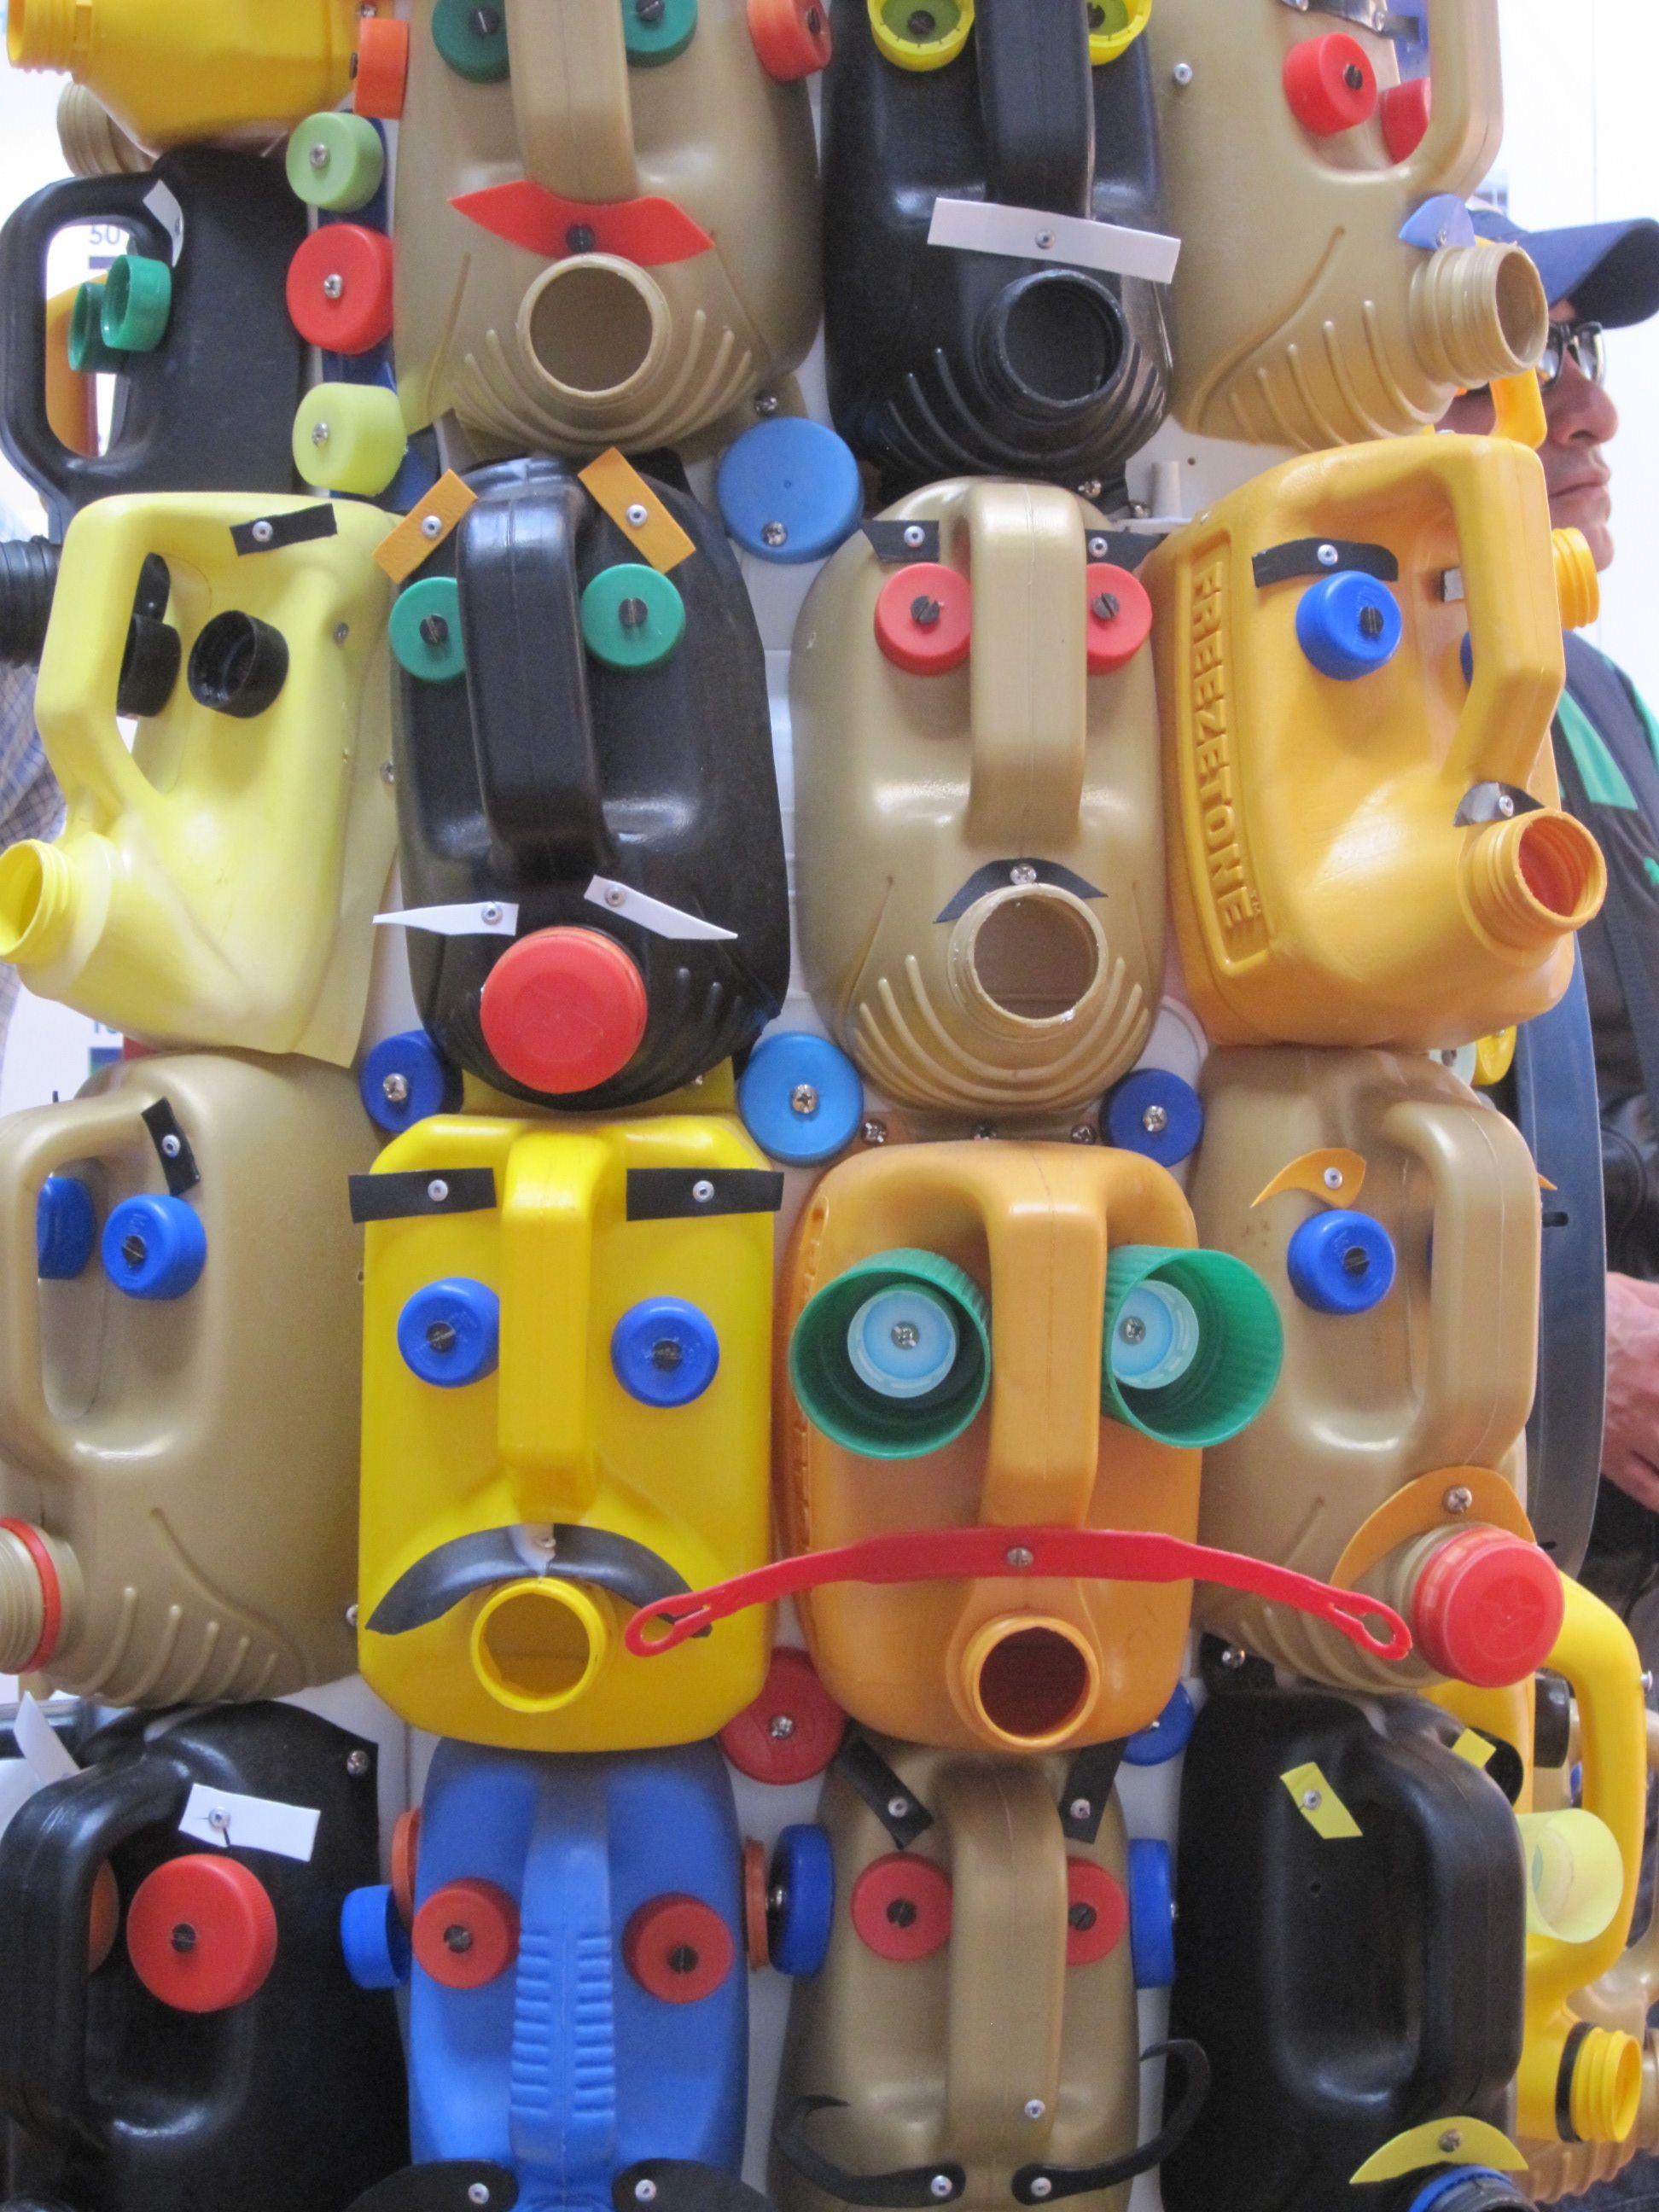 Laundry bottle heads